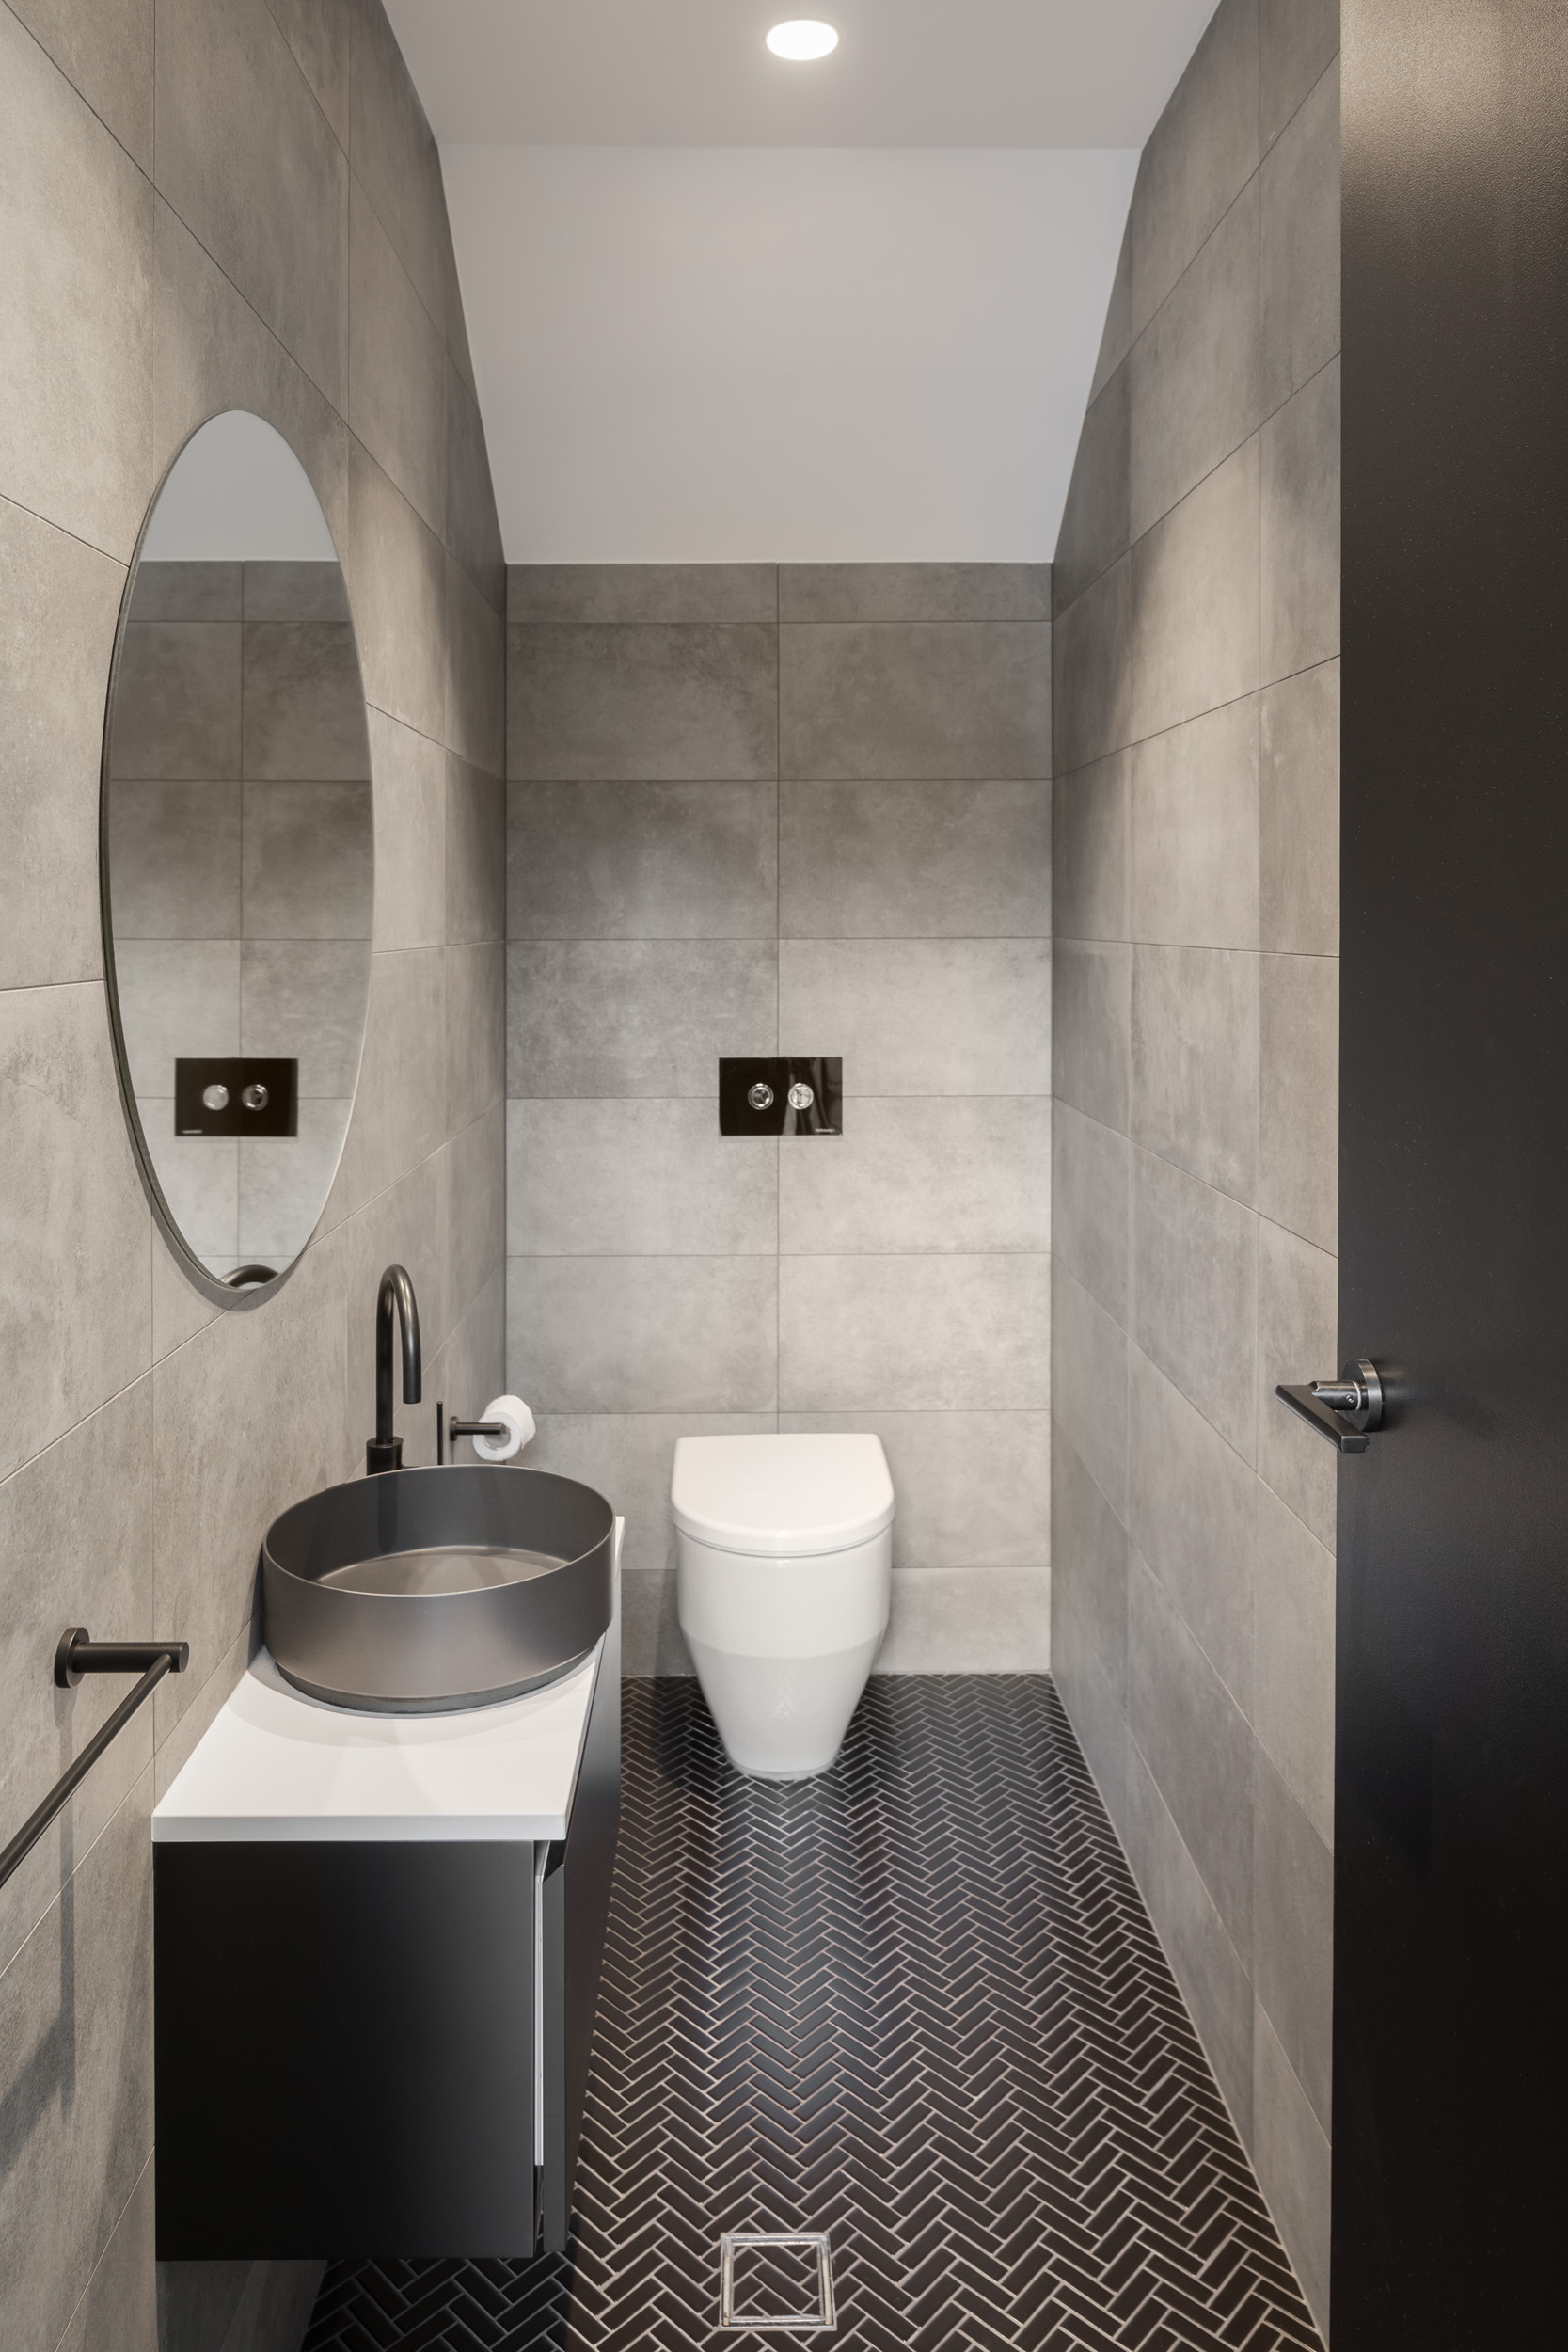 Jem_Cresswell_Architecture_Residential_Photographer_Sydney_Australia_024.jpg